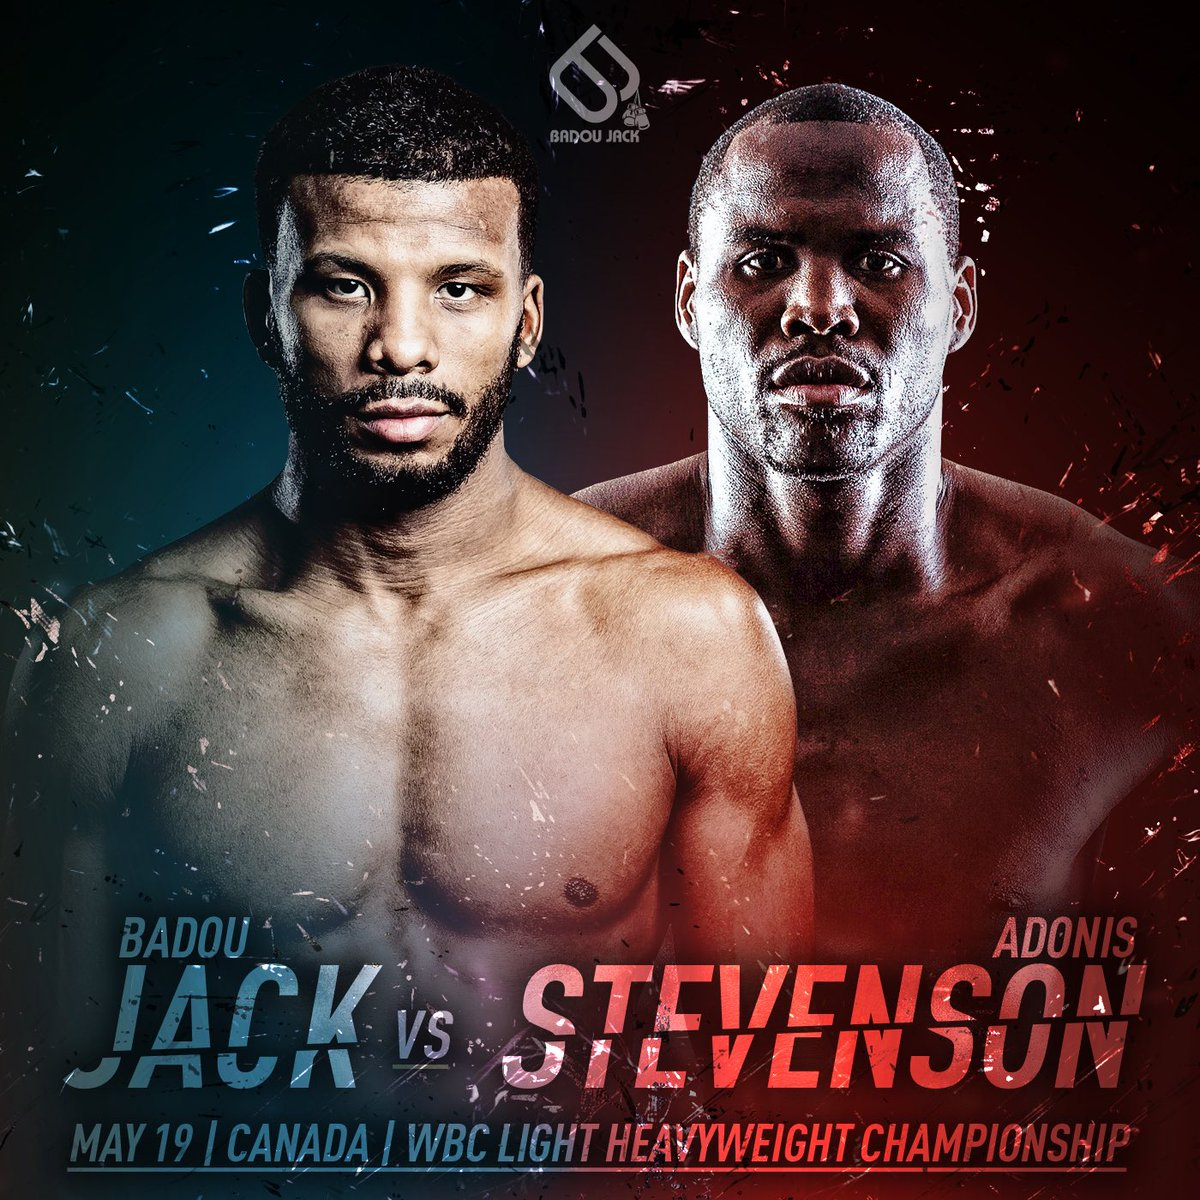 Jack vs Stevenson